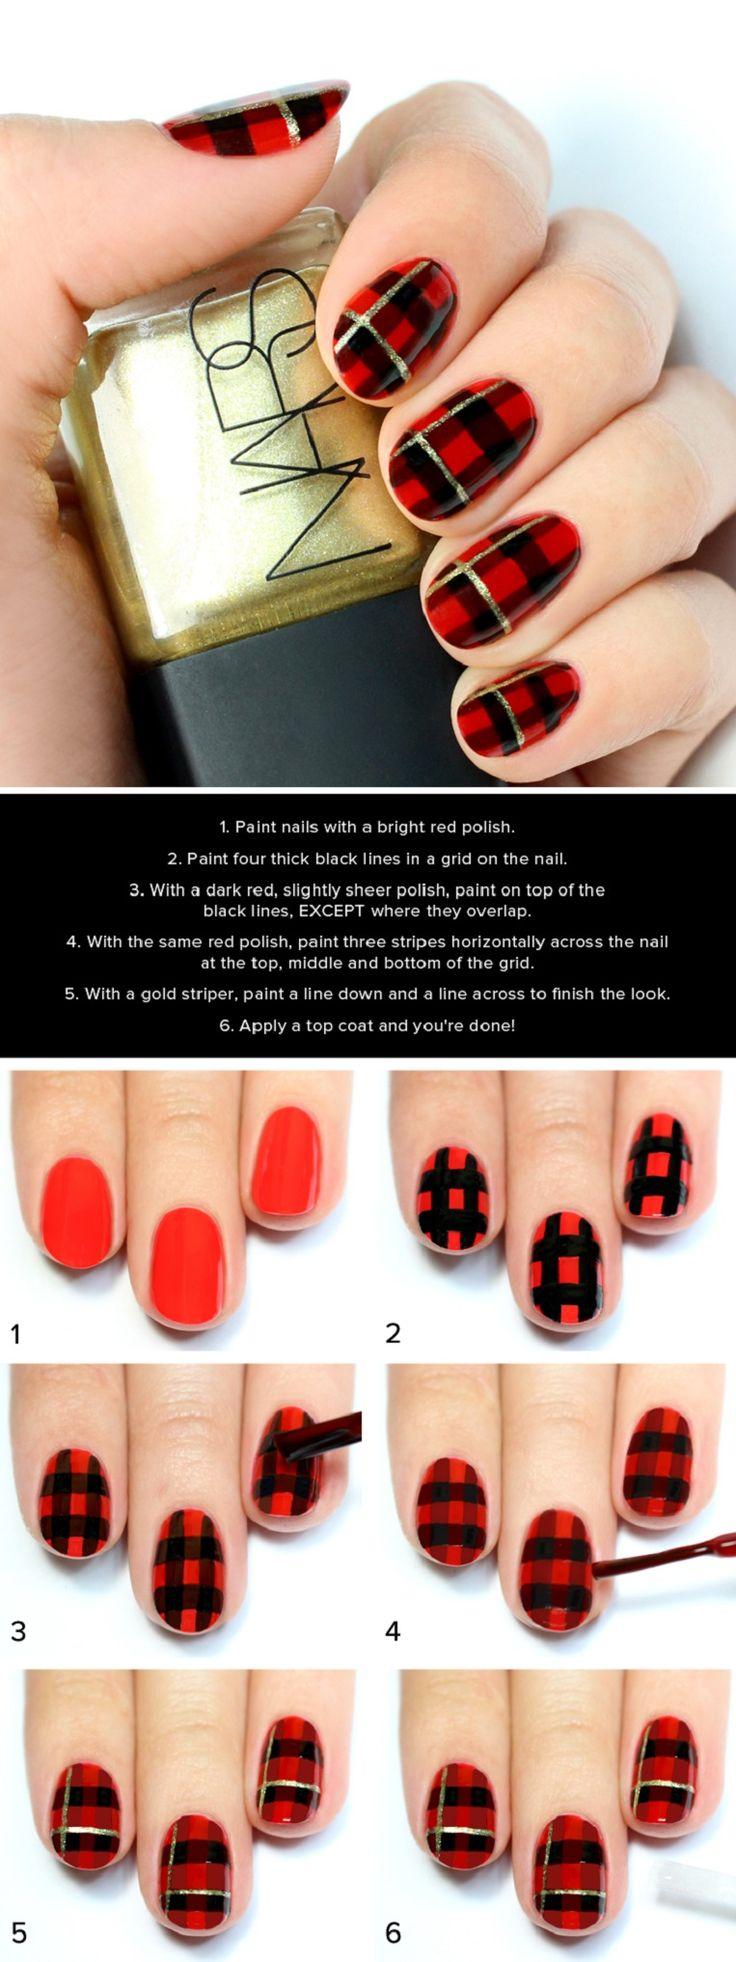 Black and Red Plaid Print Nail Tutorial - 15 Christmas-Inspired DIY Nail Art Tutorials   GleamItUp